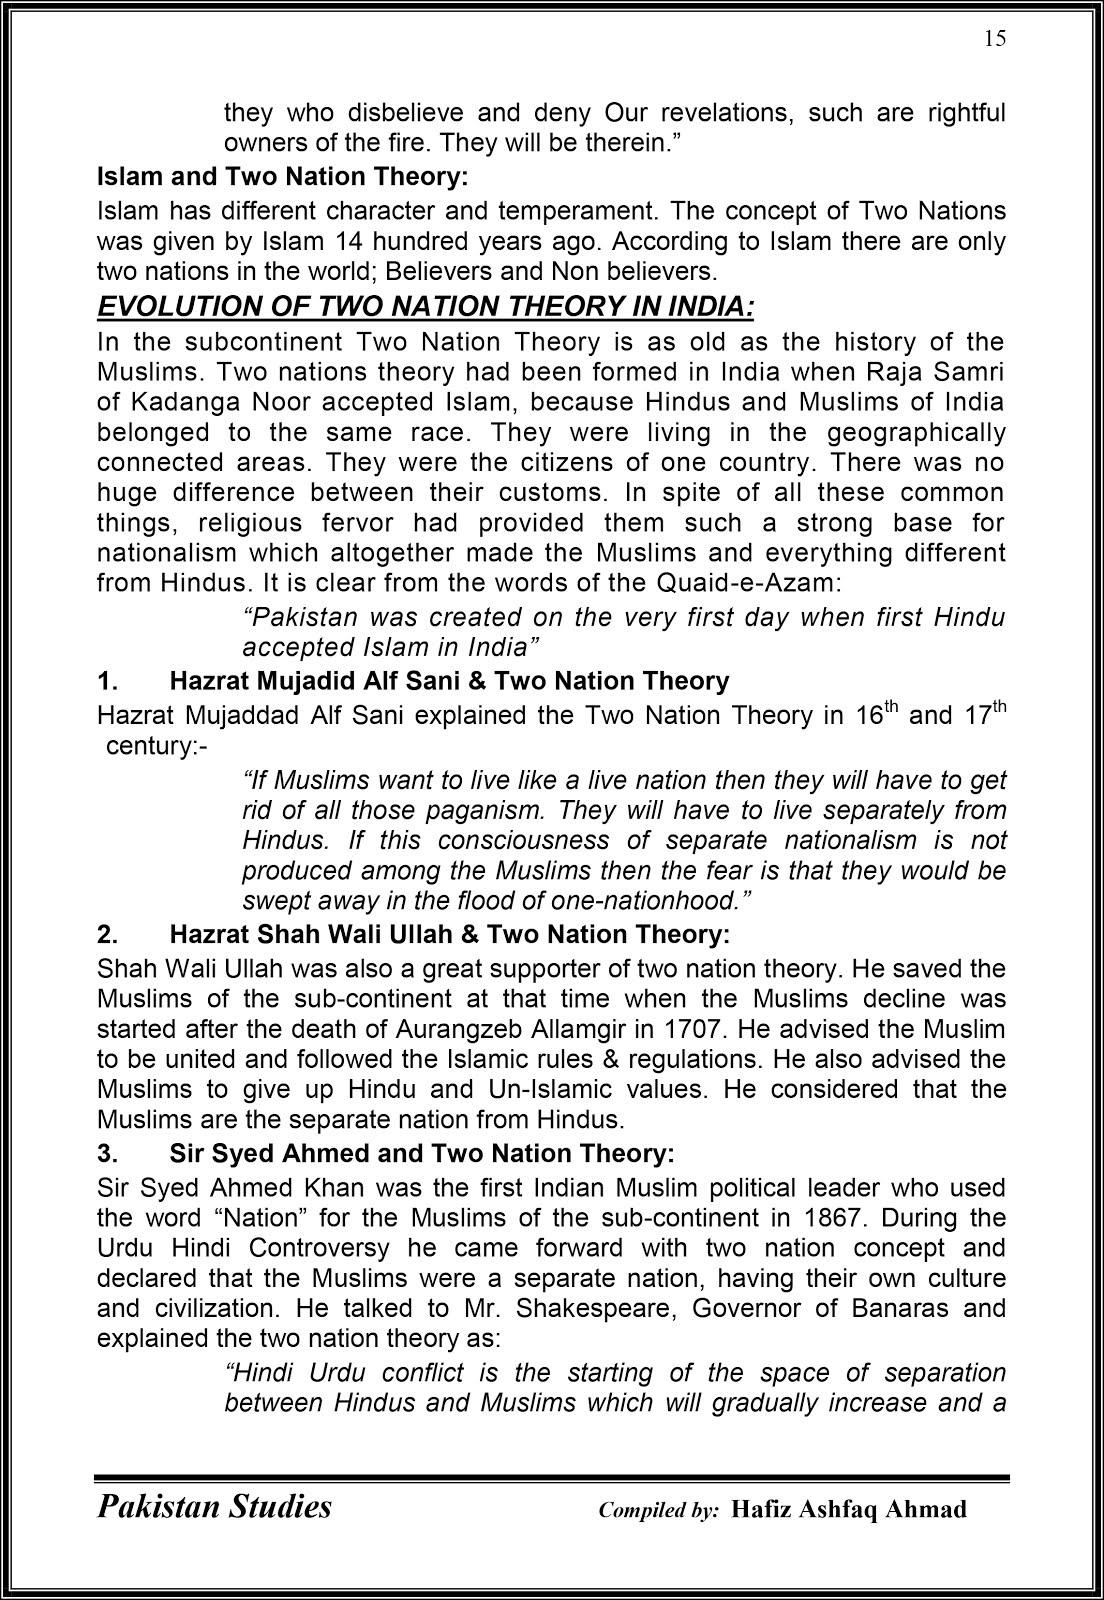 two nation theory essay 91 121 113 106 two nation theory essay